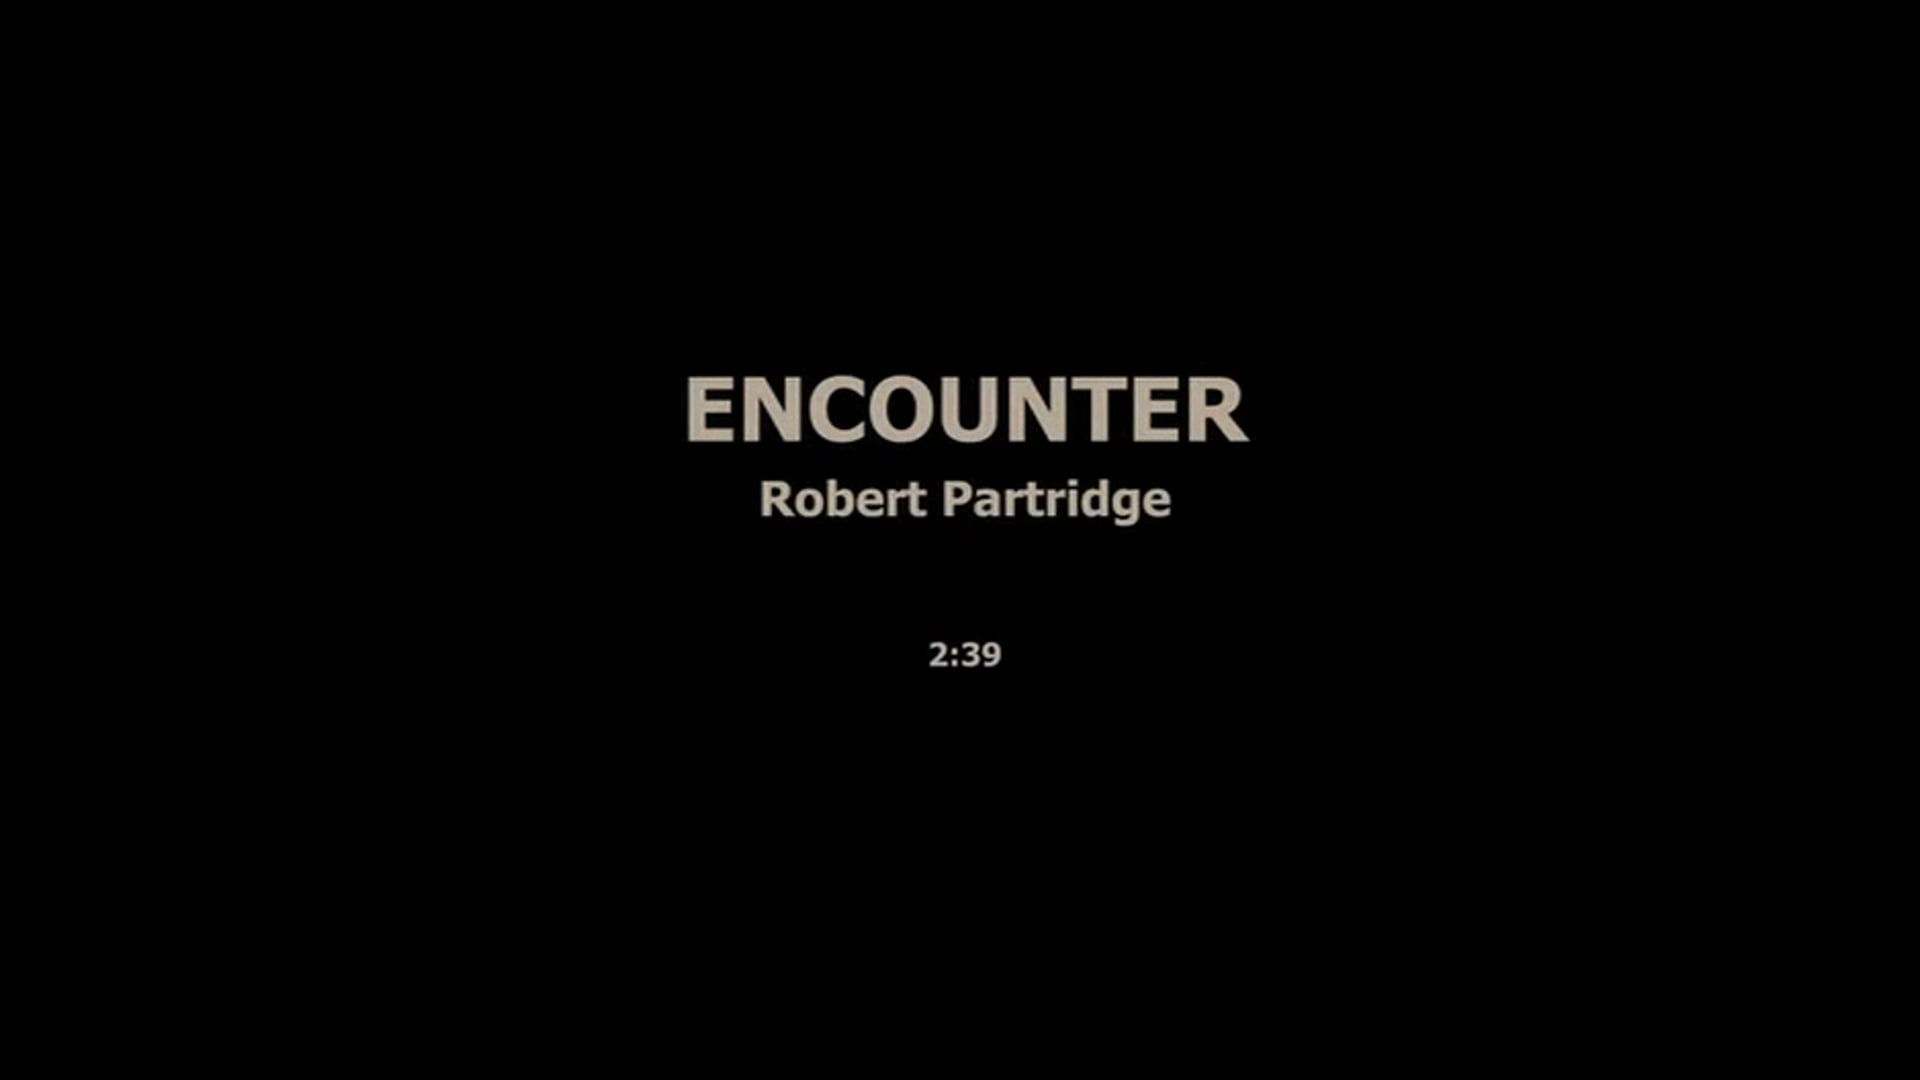 ENCOUNTER - ROBERT PARTRIDGE